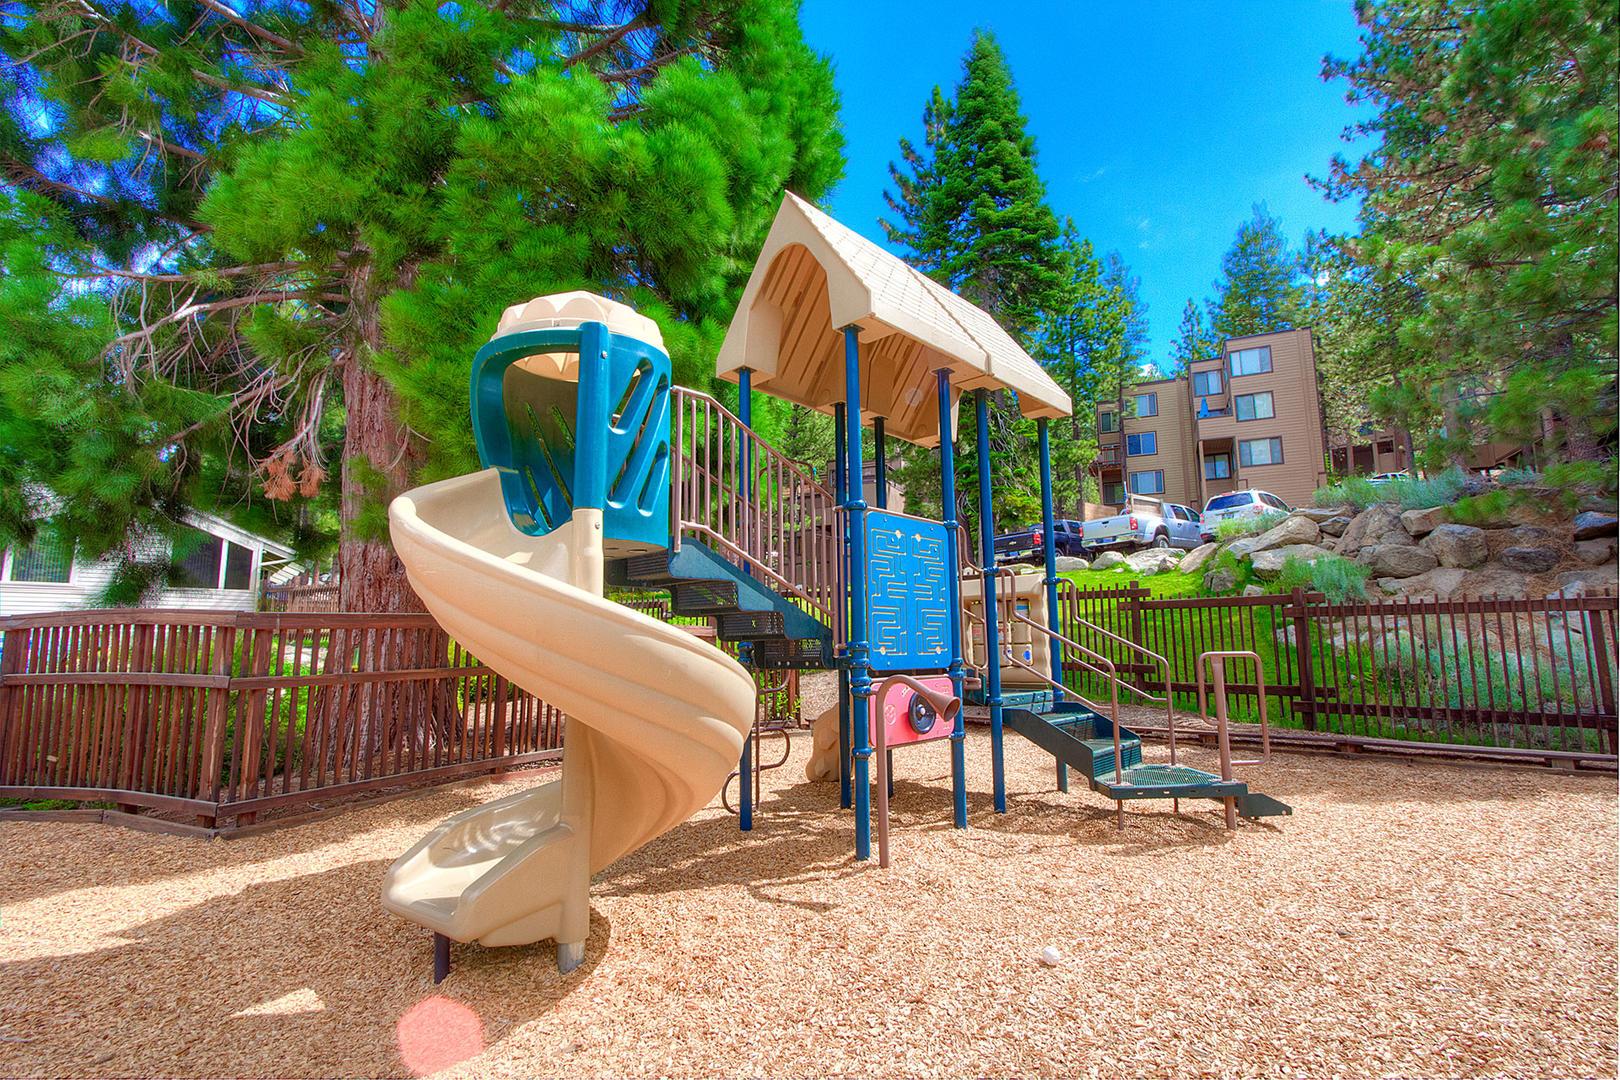 lvc0685 community playground